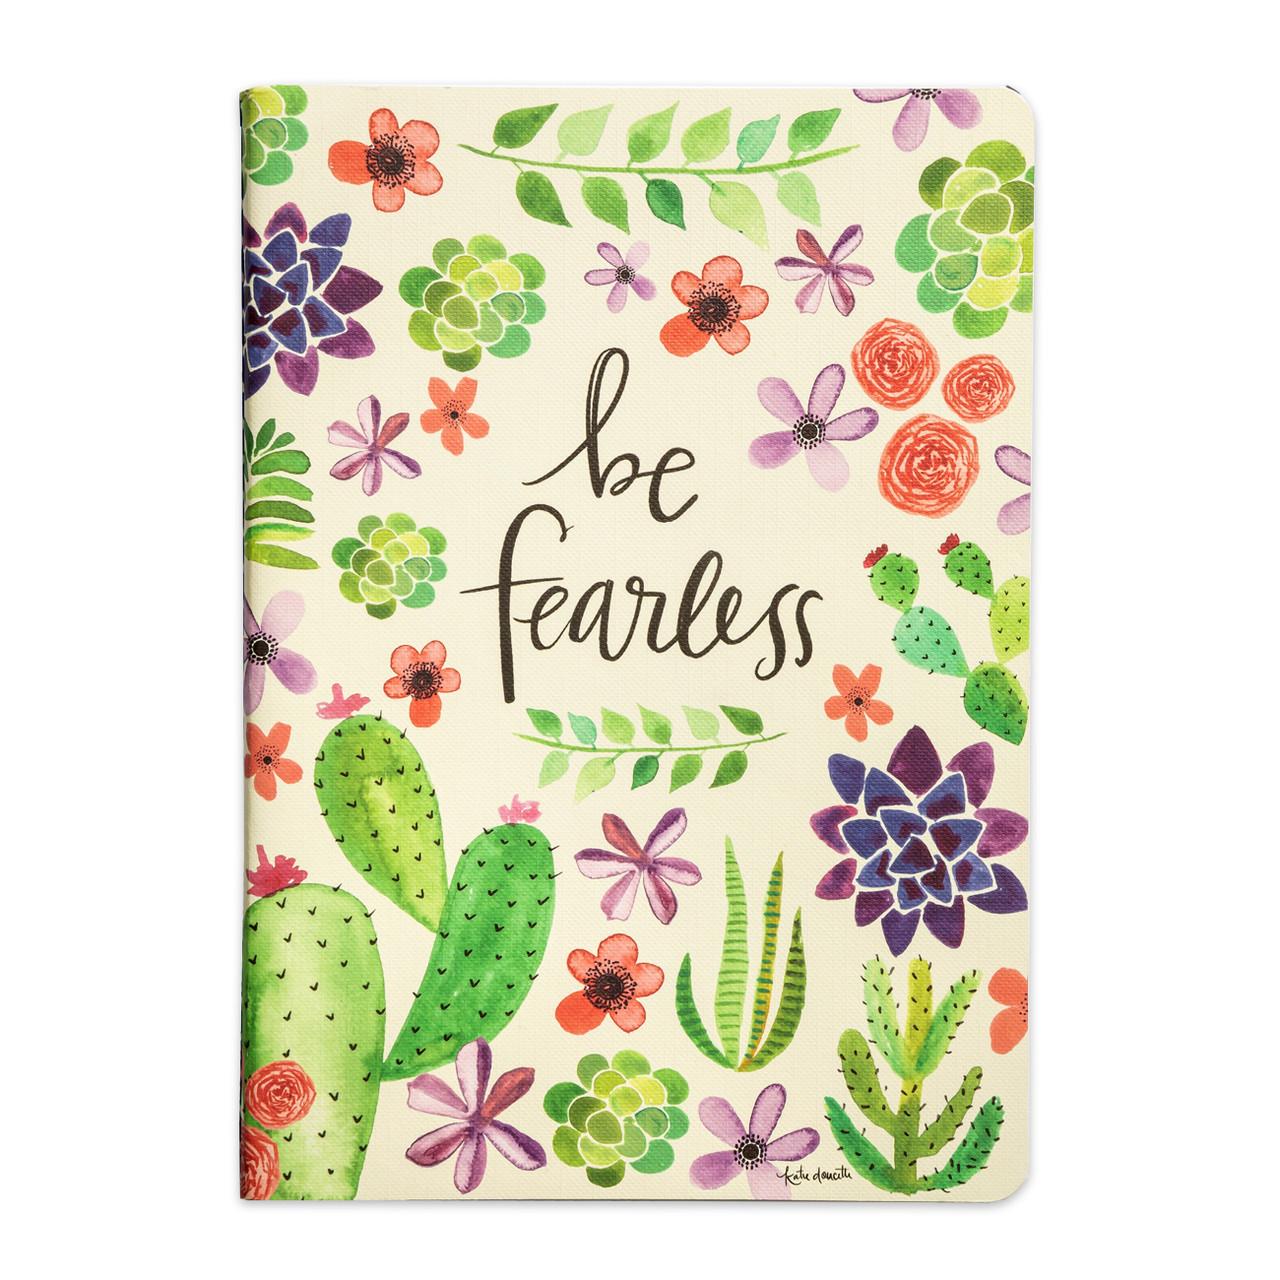 be fearless notebook journal gift inspirational